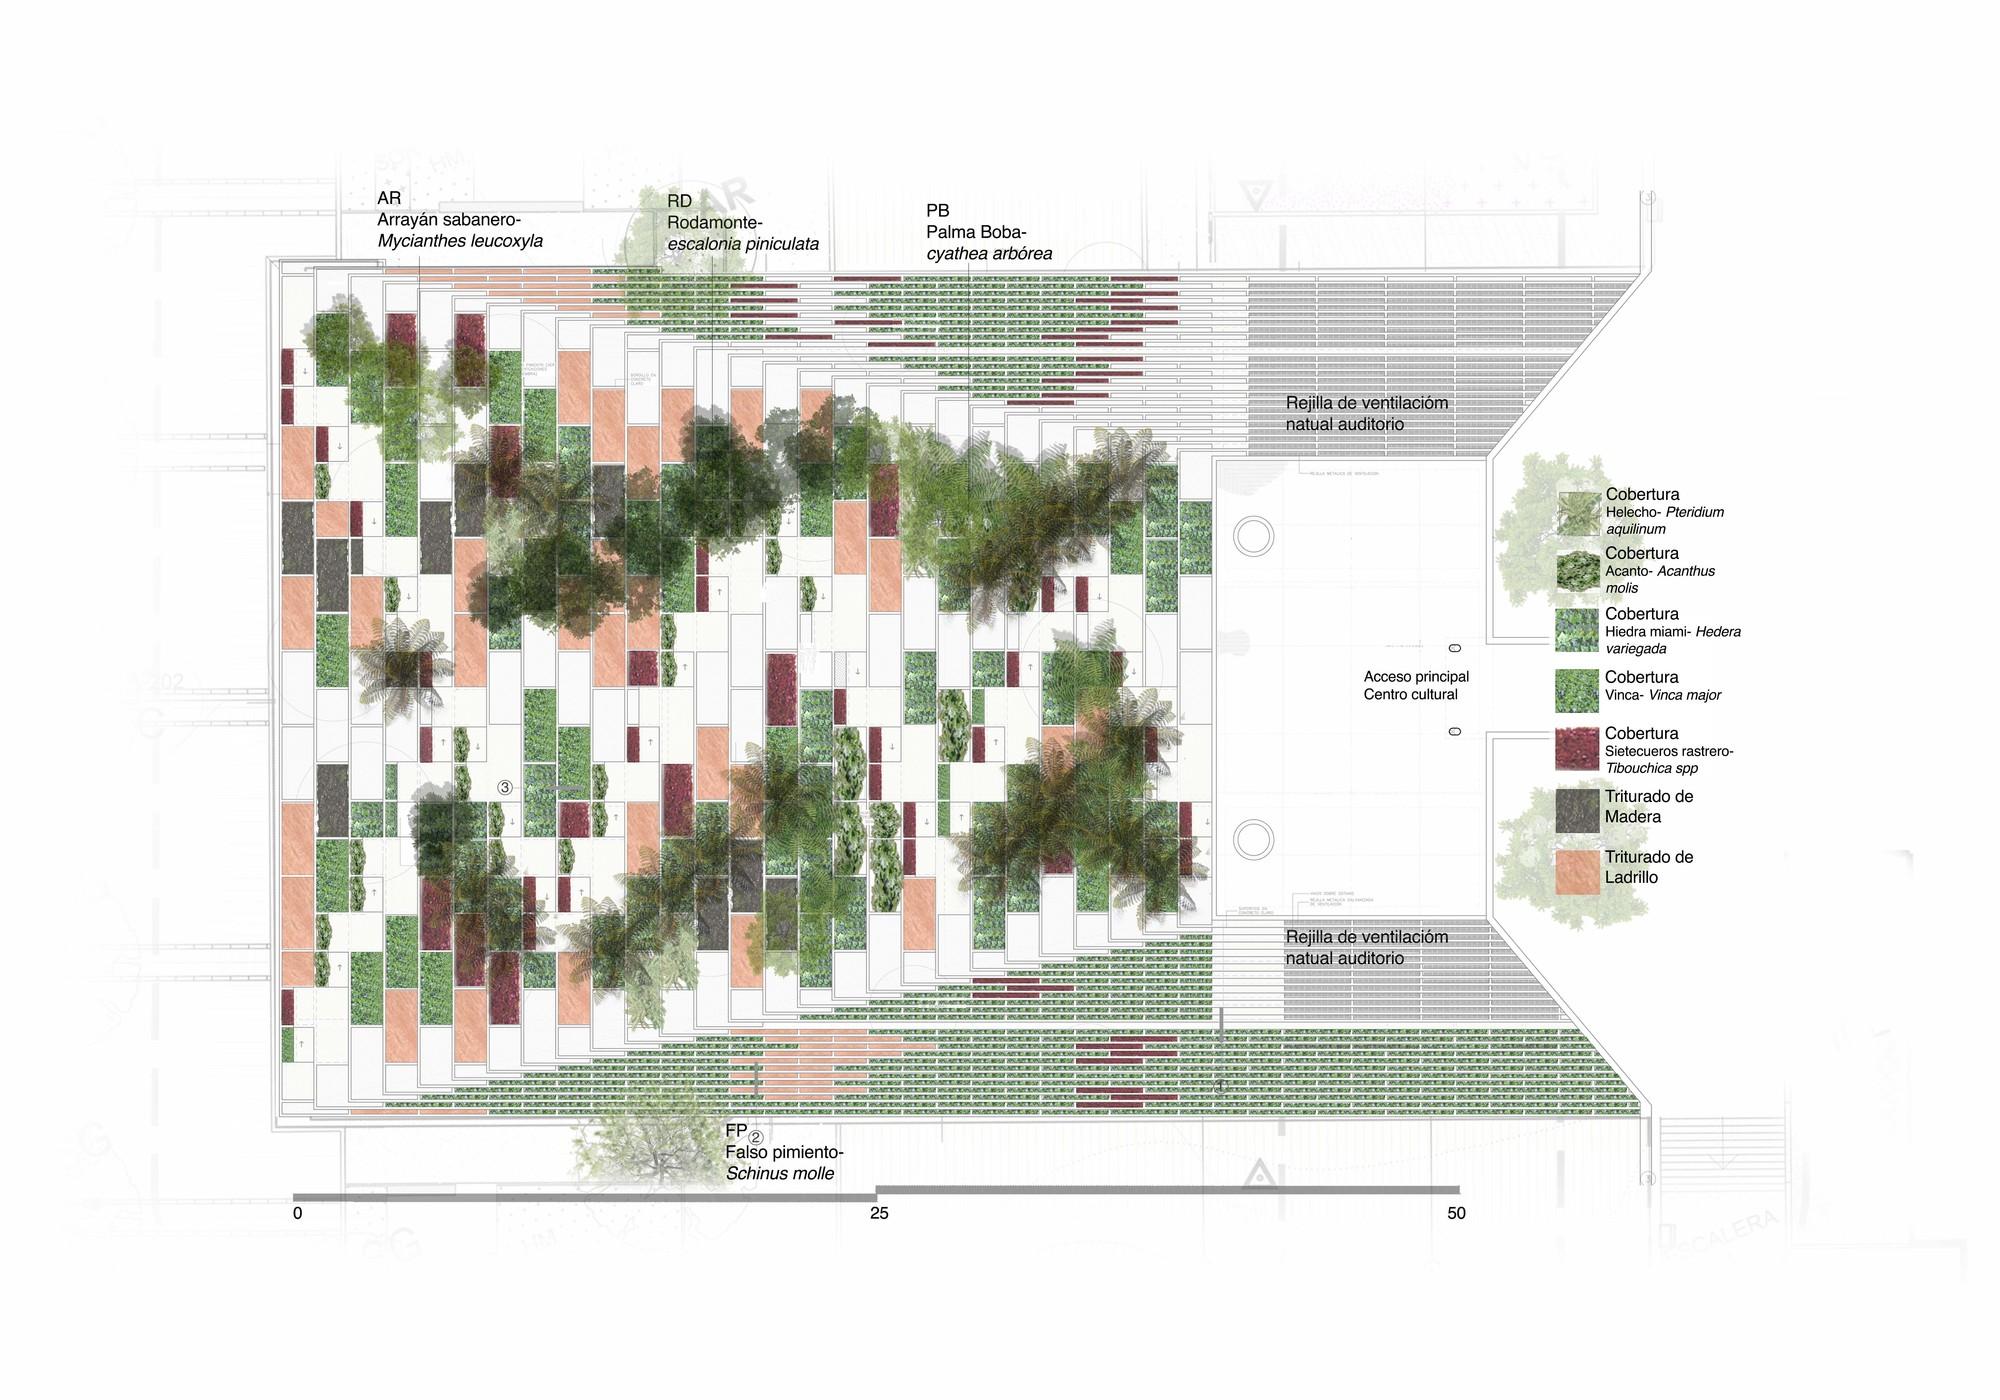 Galer a de arquitectura y paisaje espacios verdes for Arquitectura del paisaje